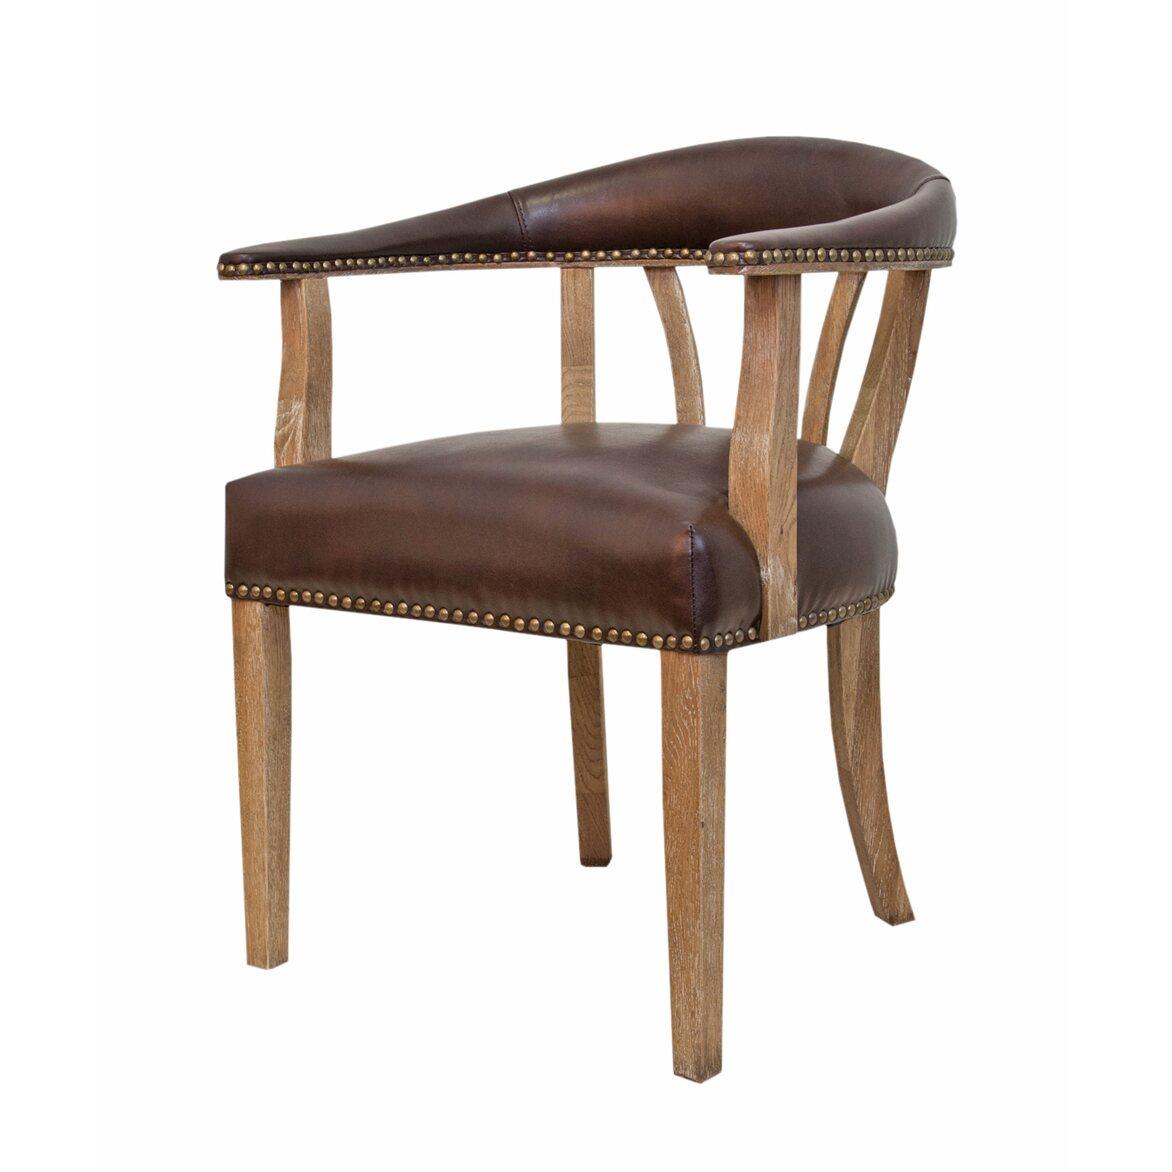 Стул Tanner 4 | Обеденные стулья Kingsby